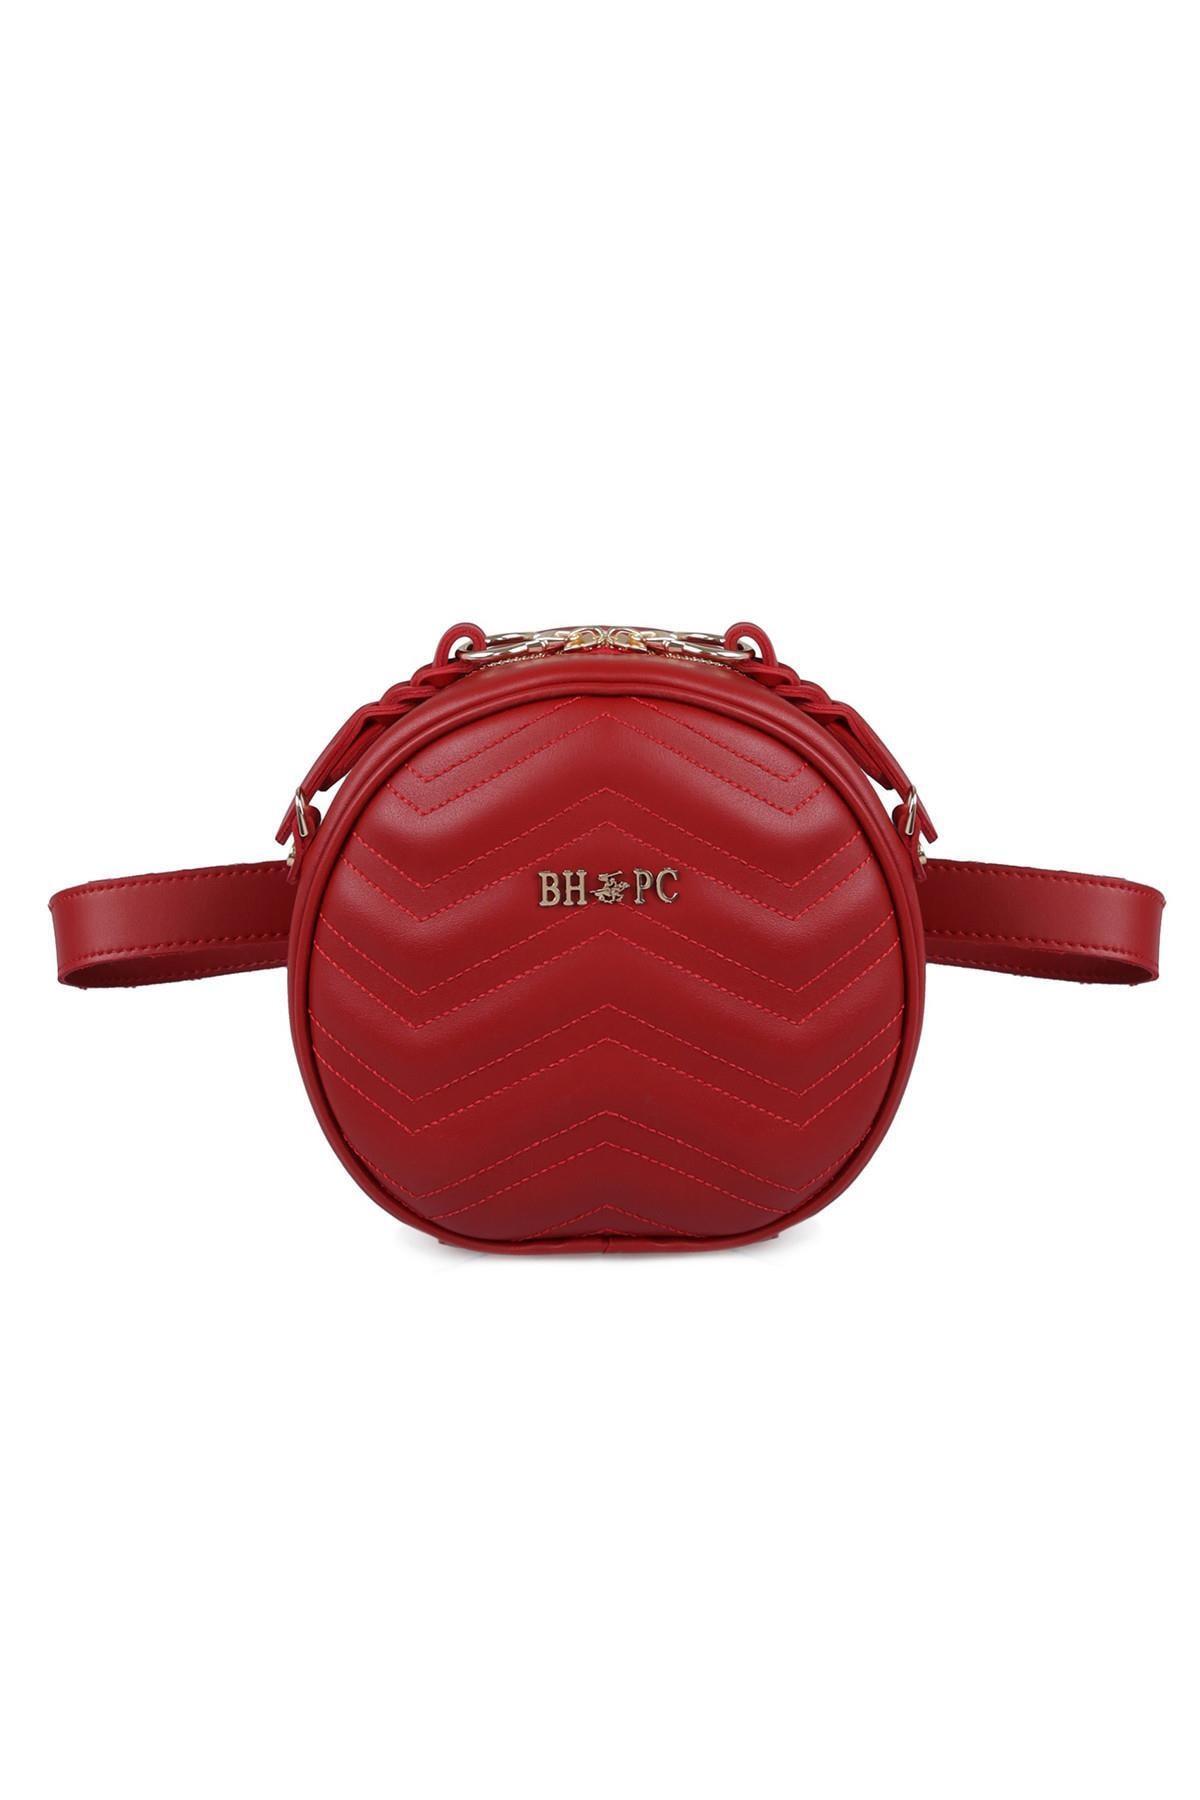 Beverly Hills Polo Club Kadın Zikzaklı Yuvarlak Bel Çantası Kırmızı 1